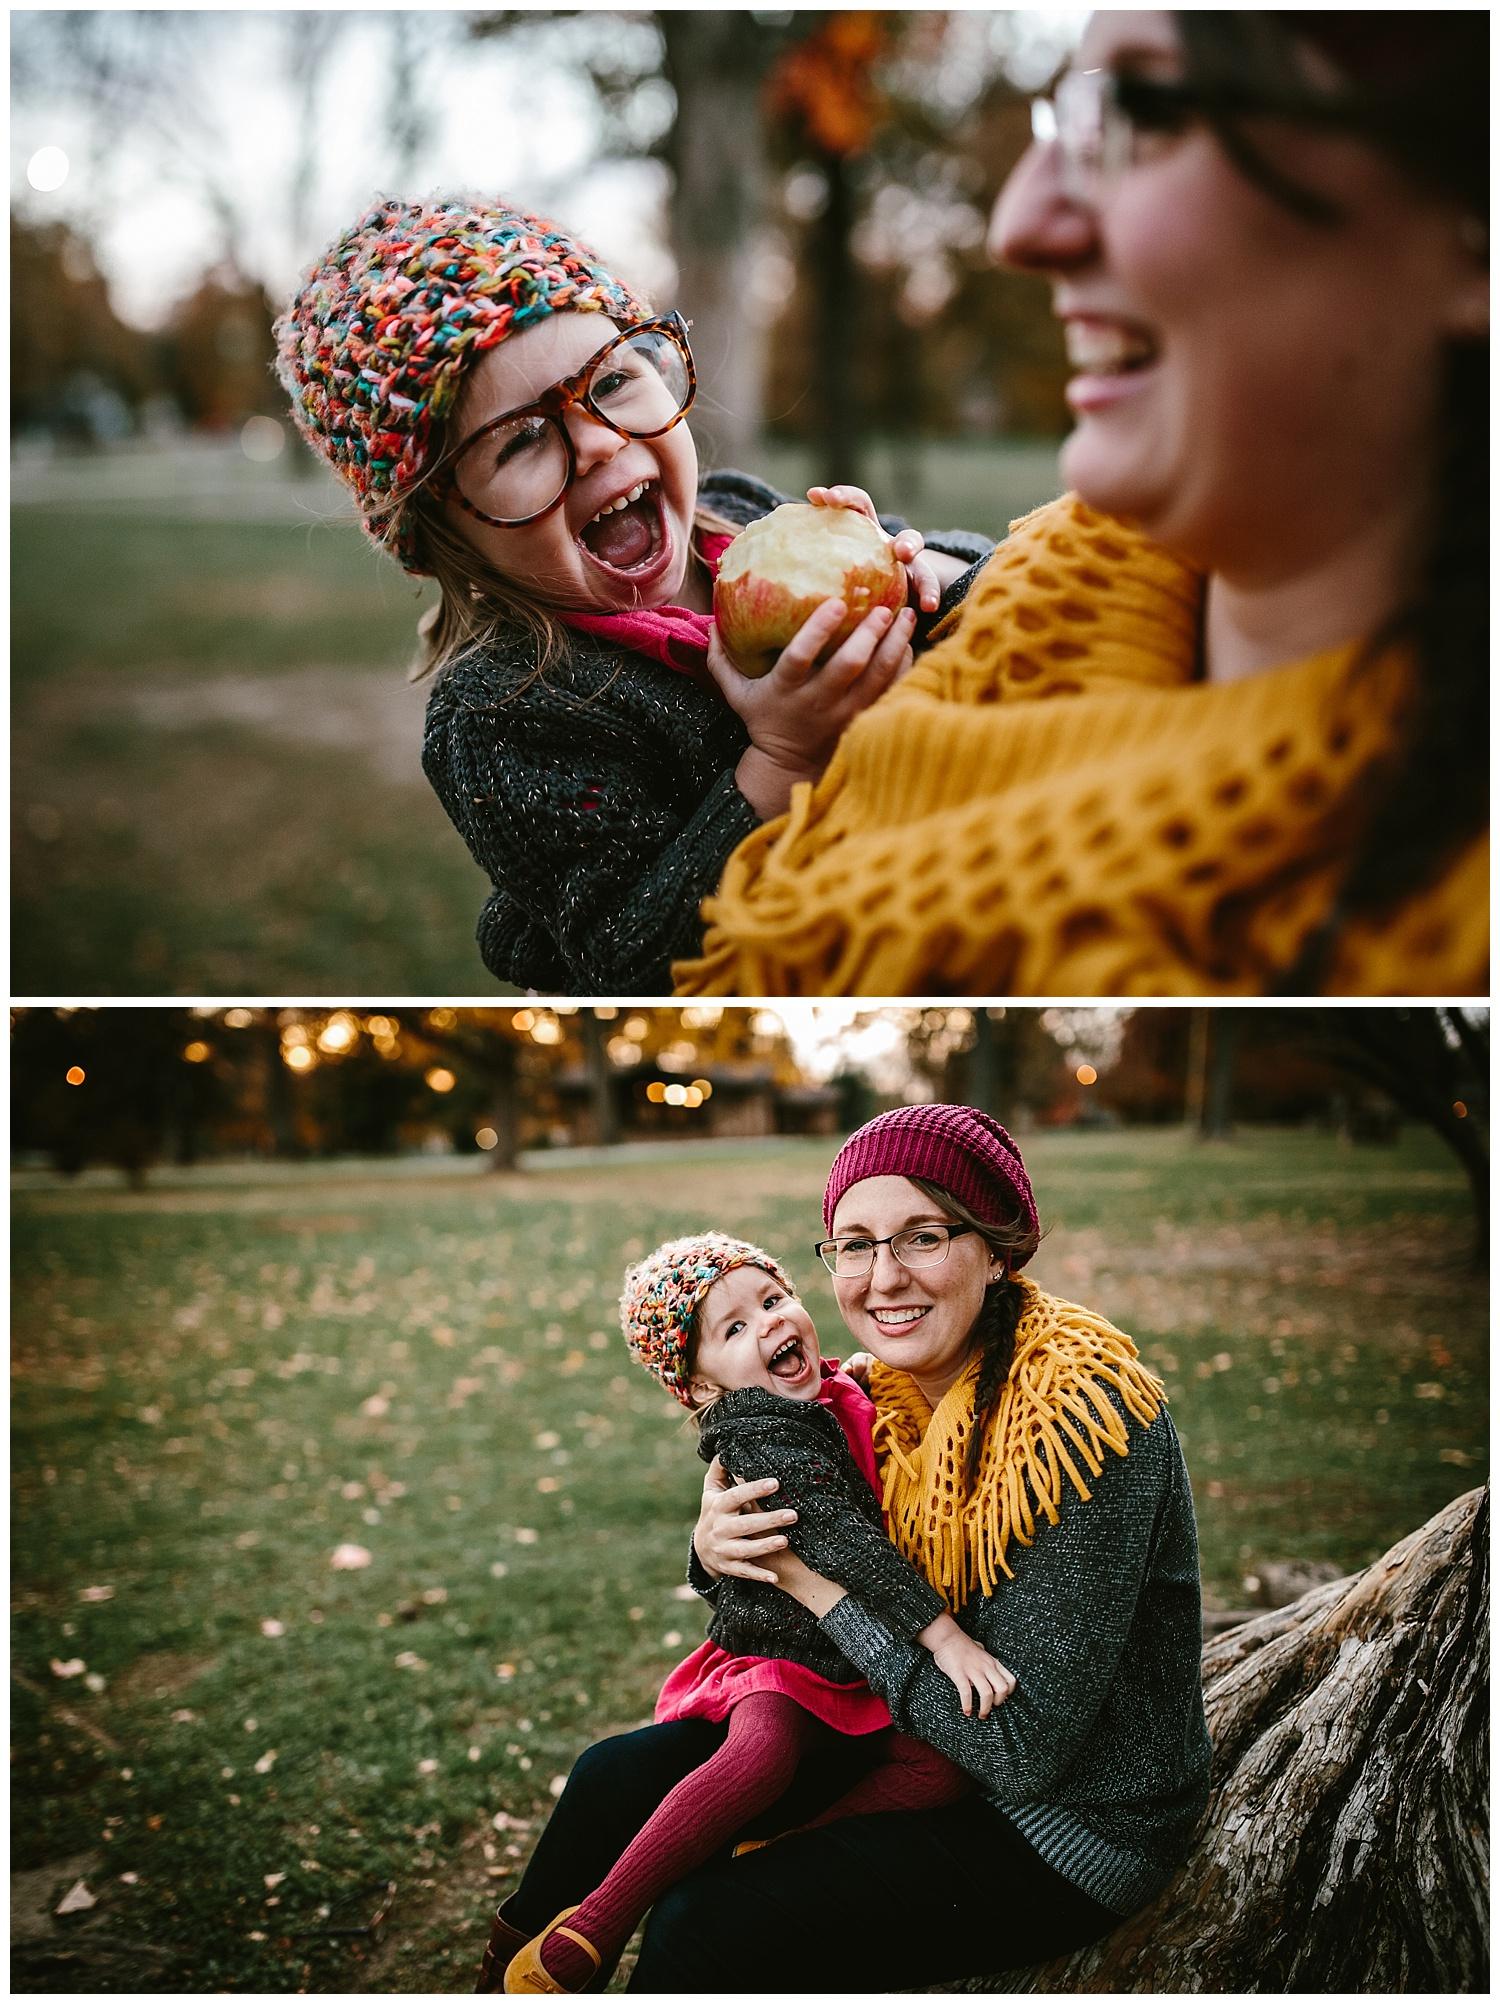 Springfield Missouri family photographers.jpg